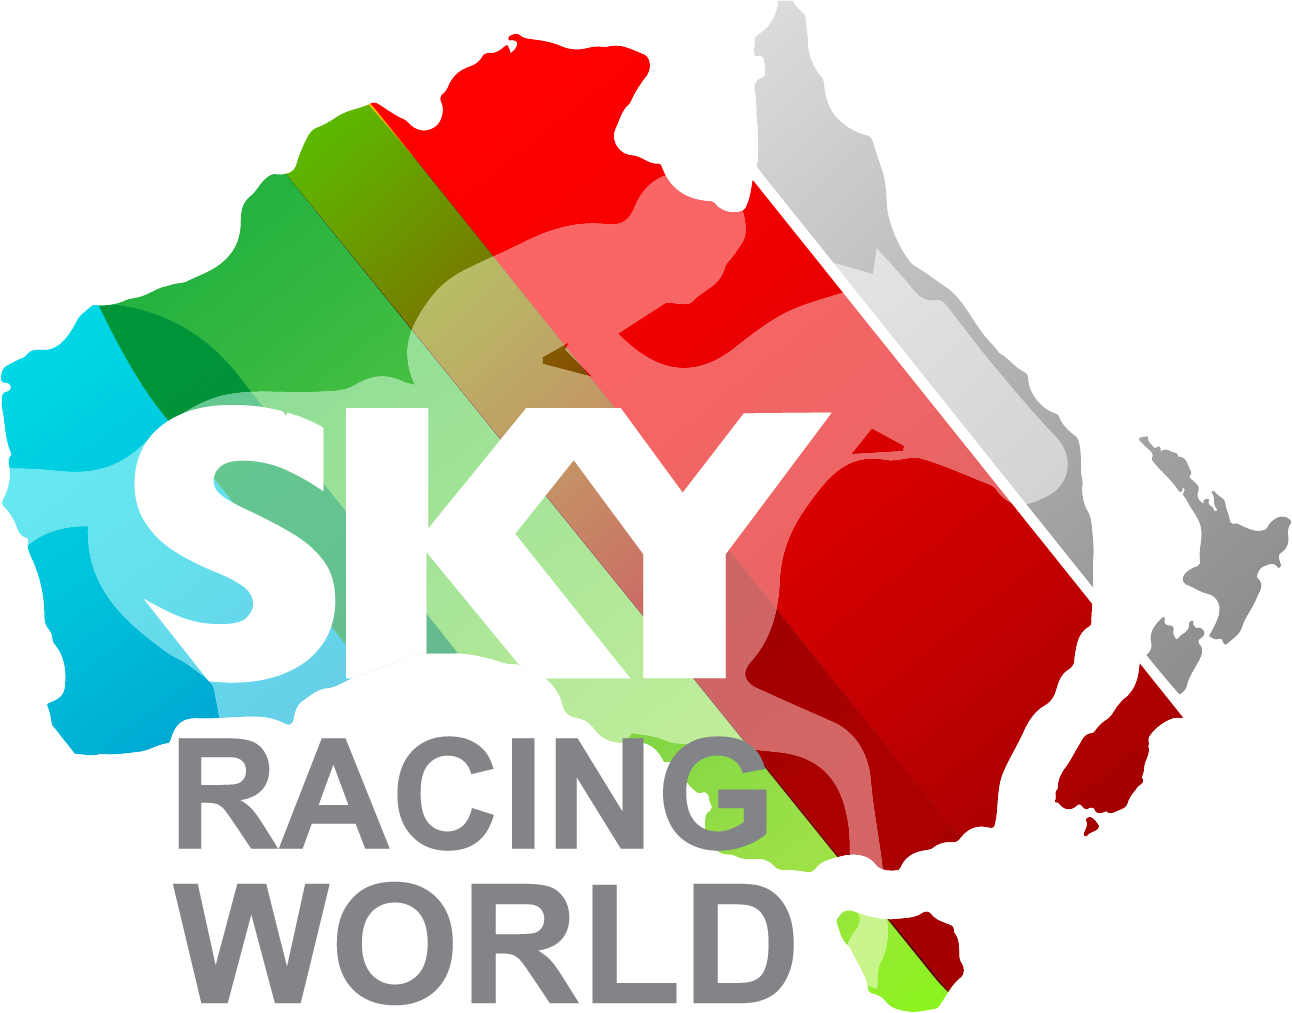 Sky Racing World.jpg